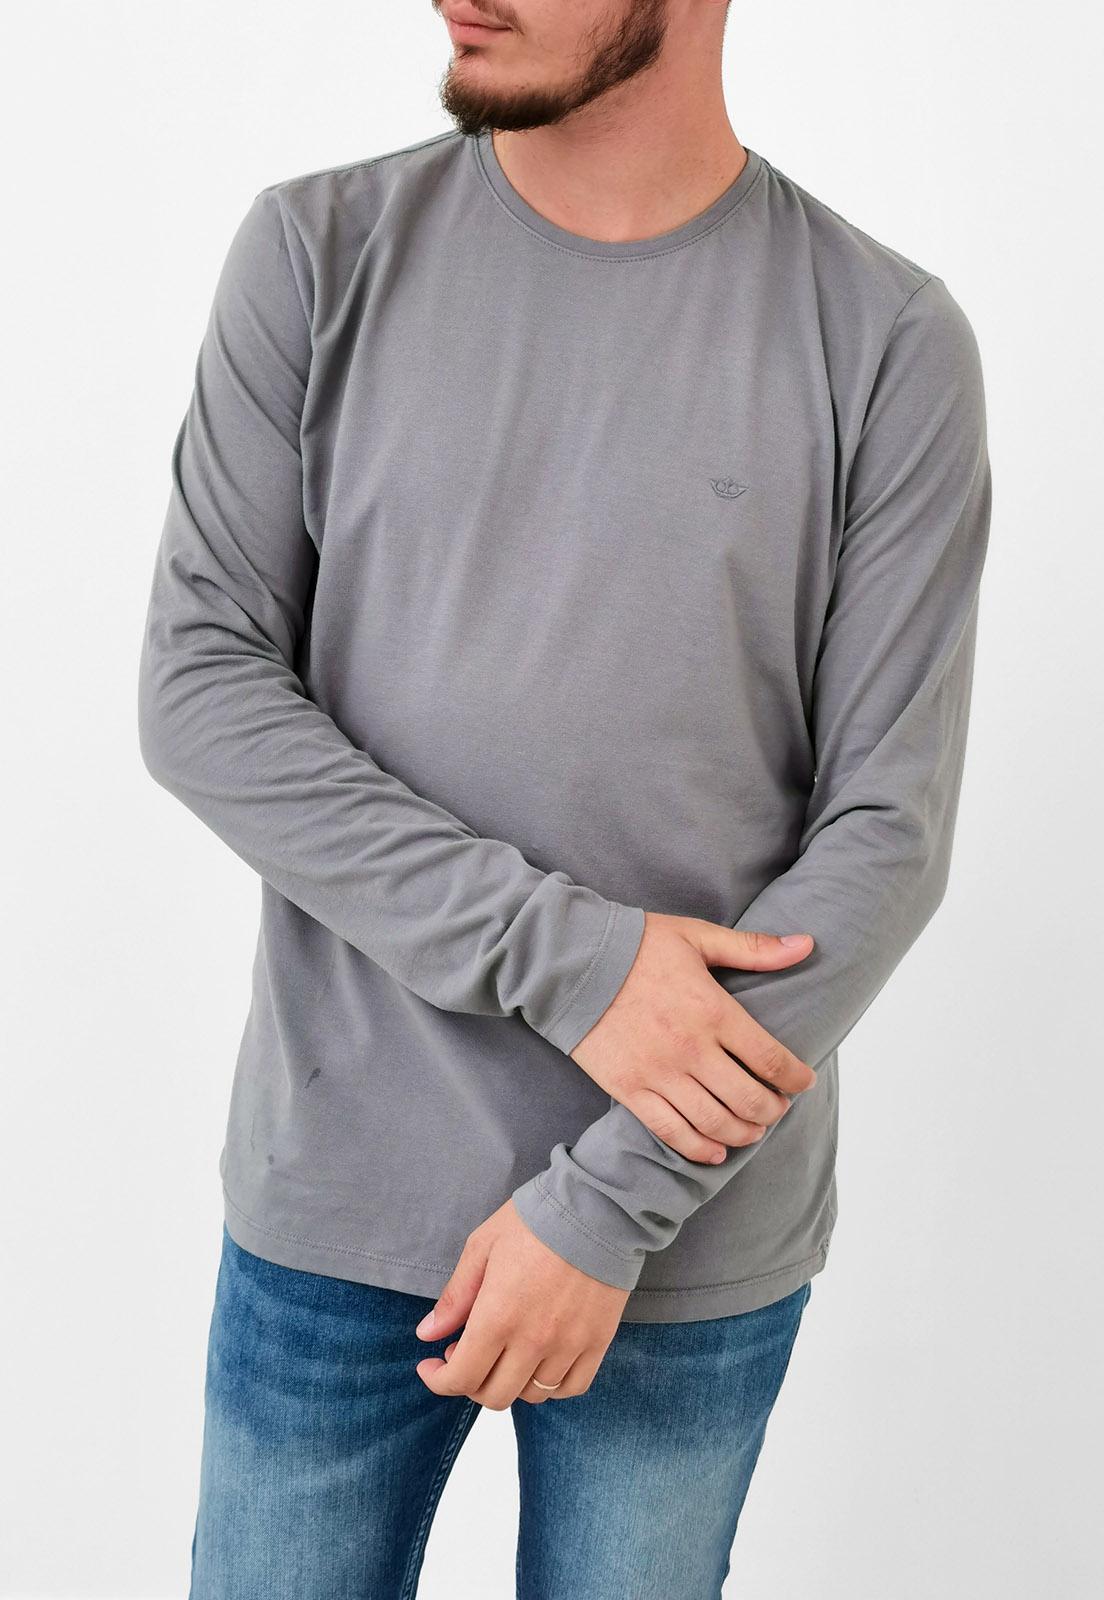 Camiseta Manga Longa Docthos Básica Cinza